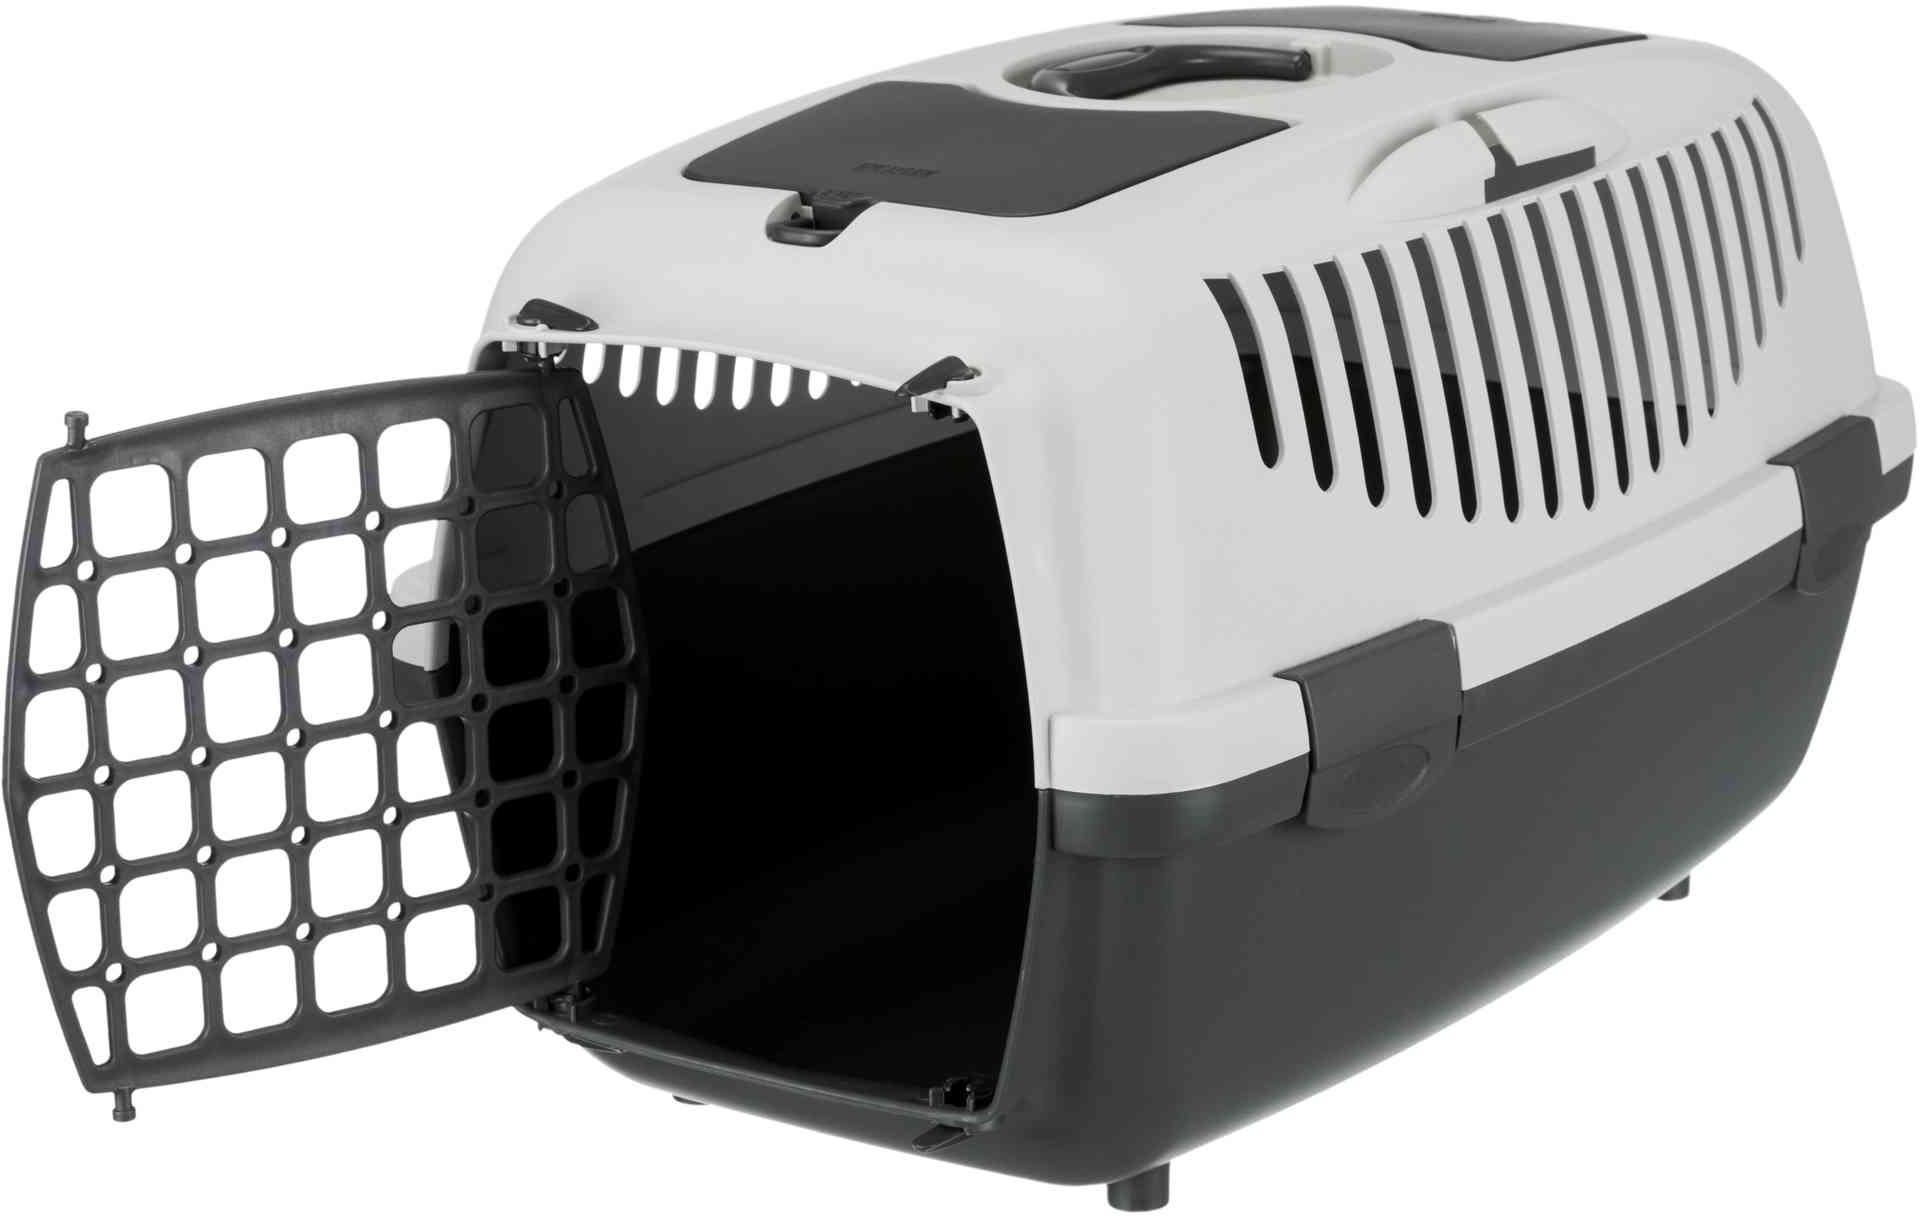 trixie transportbox capri hellgrau dunkelgrau f r hunde. Black Bedroom Furniture Sets. Home Design Ideas